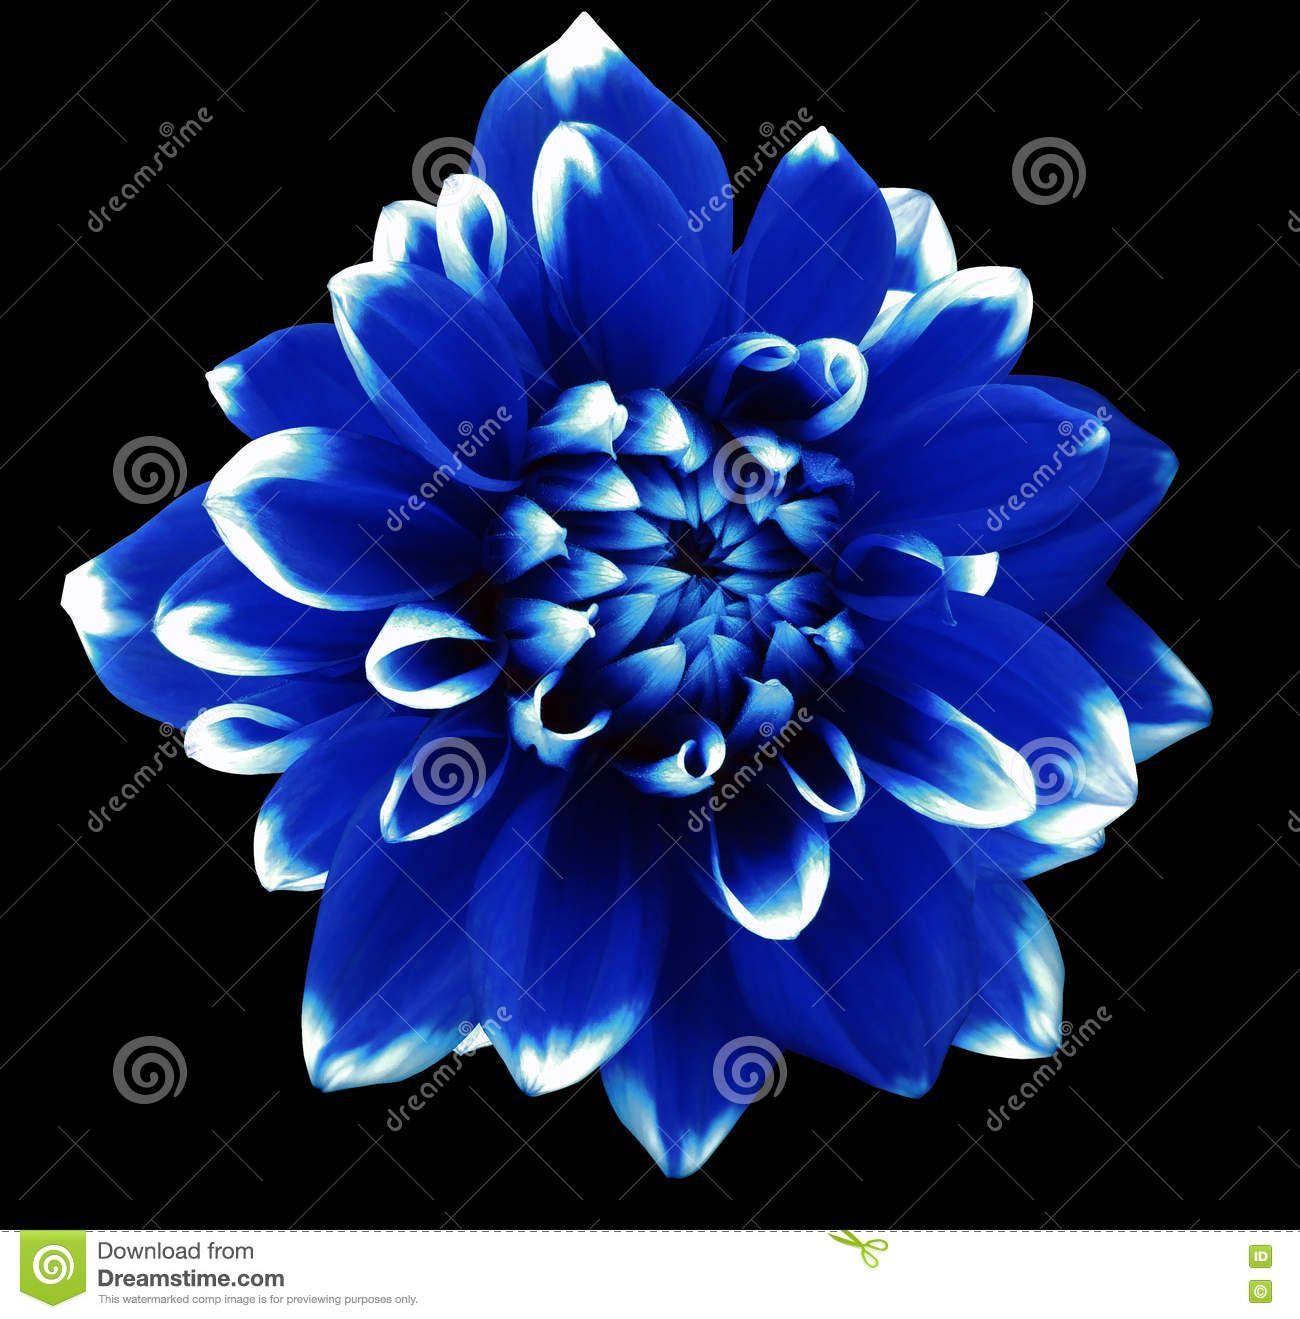 Flower Blue And White Motley Dahlia Flowers Pinterest Dahlia